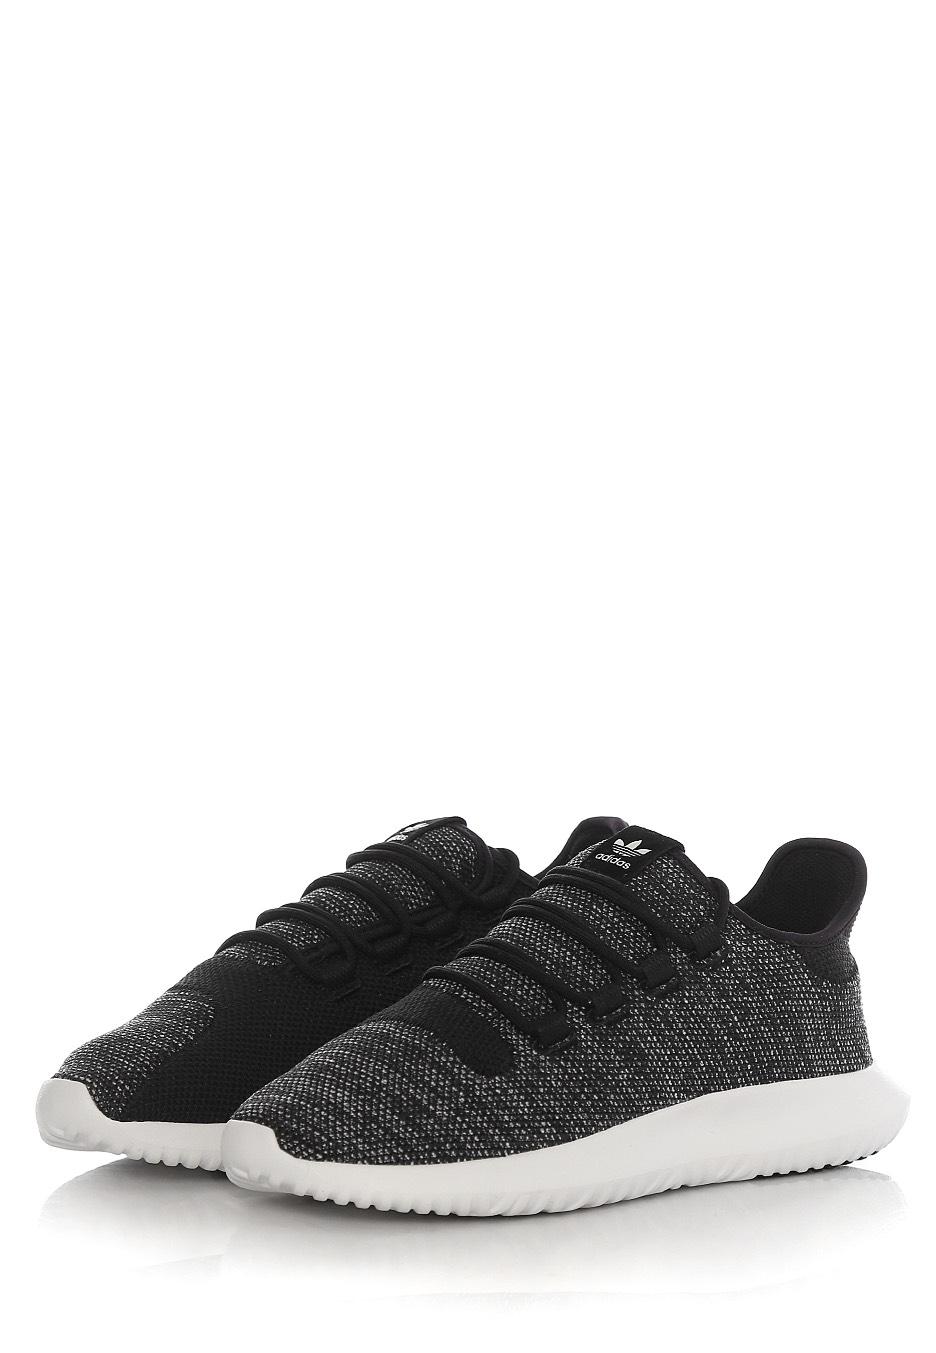 be73cb62 ... reduced adidas tubular shadow knit core black utility black vintage  white shoes 8d87c 2f434